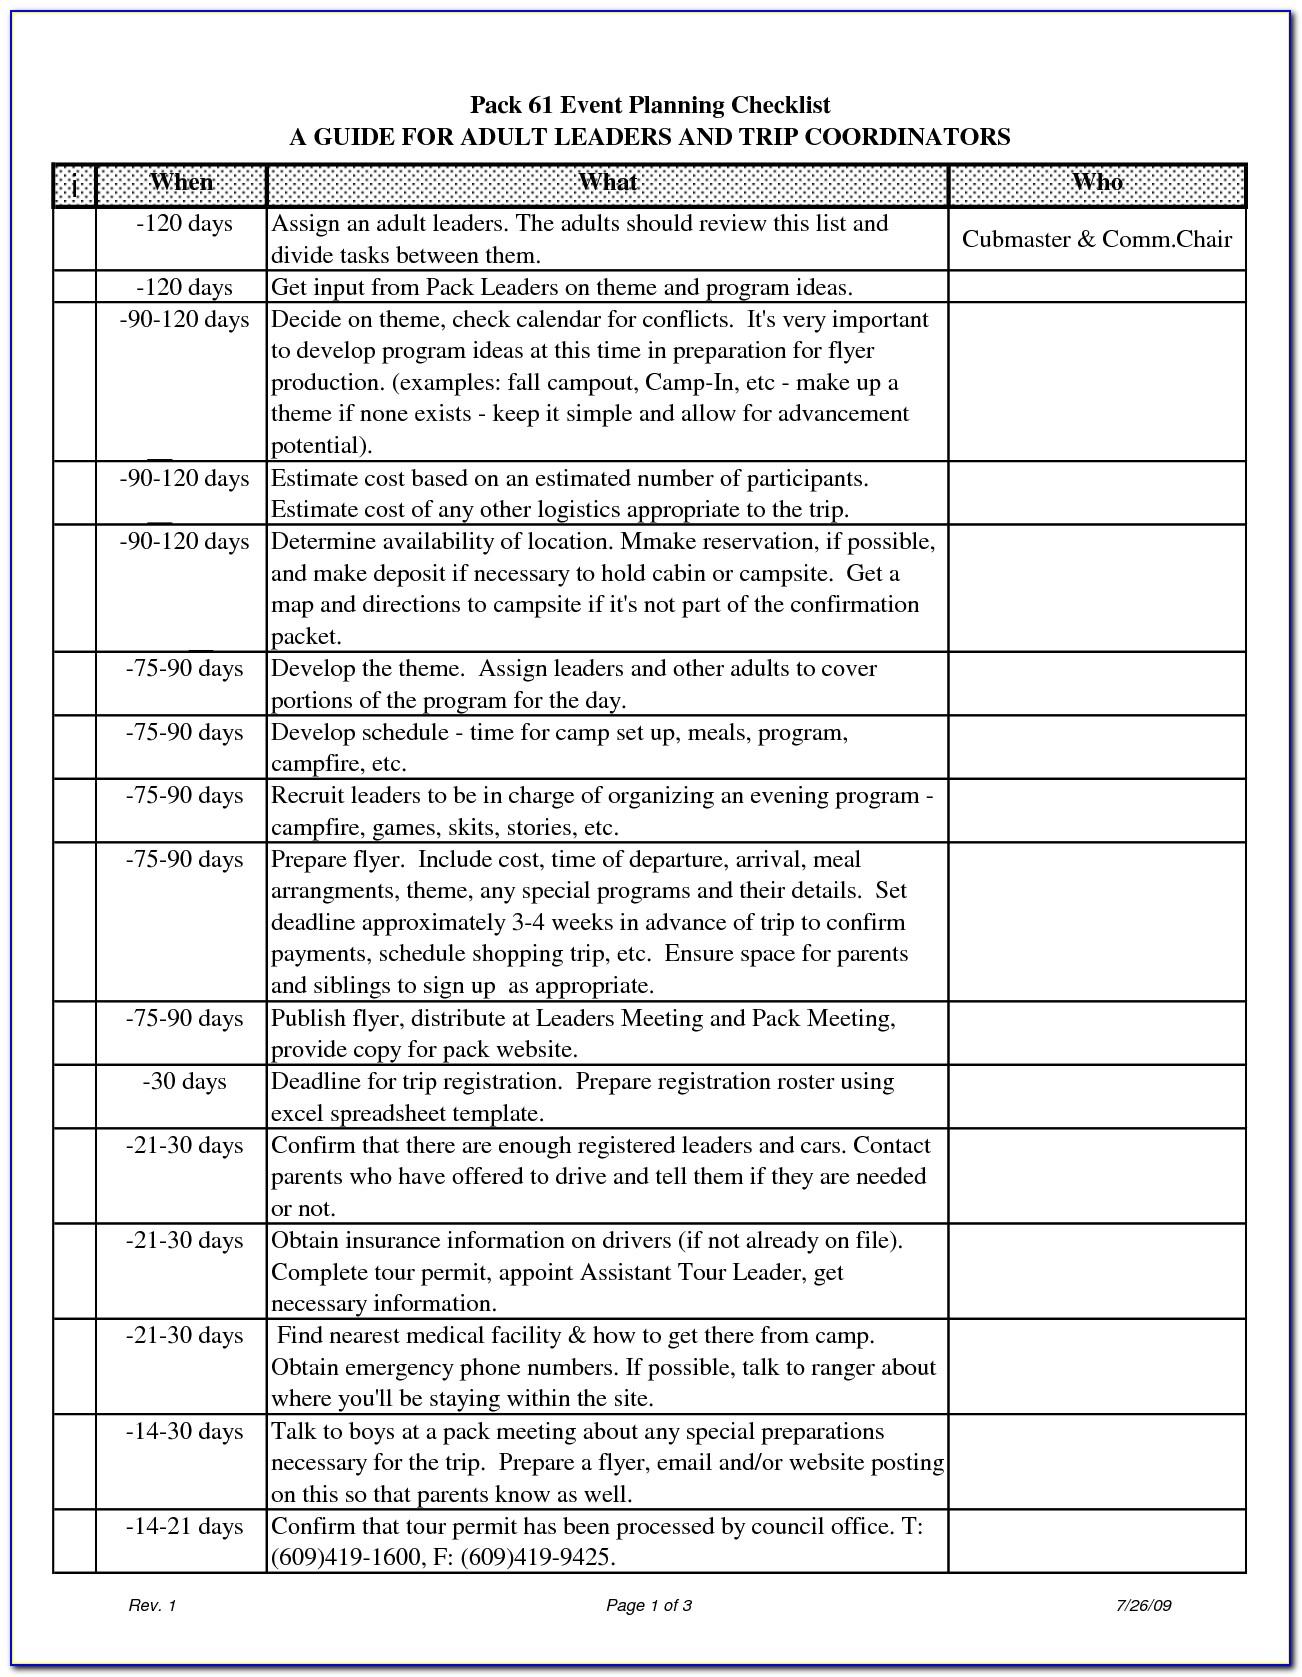 Event Planning Checklist Template Word